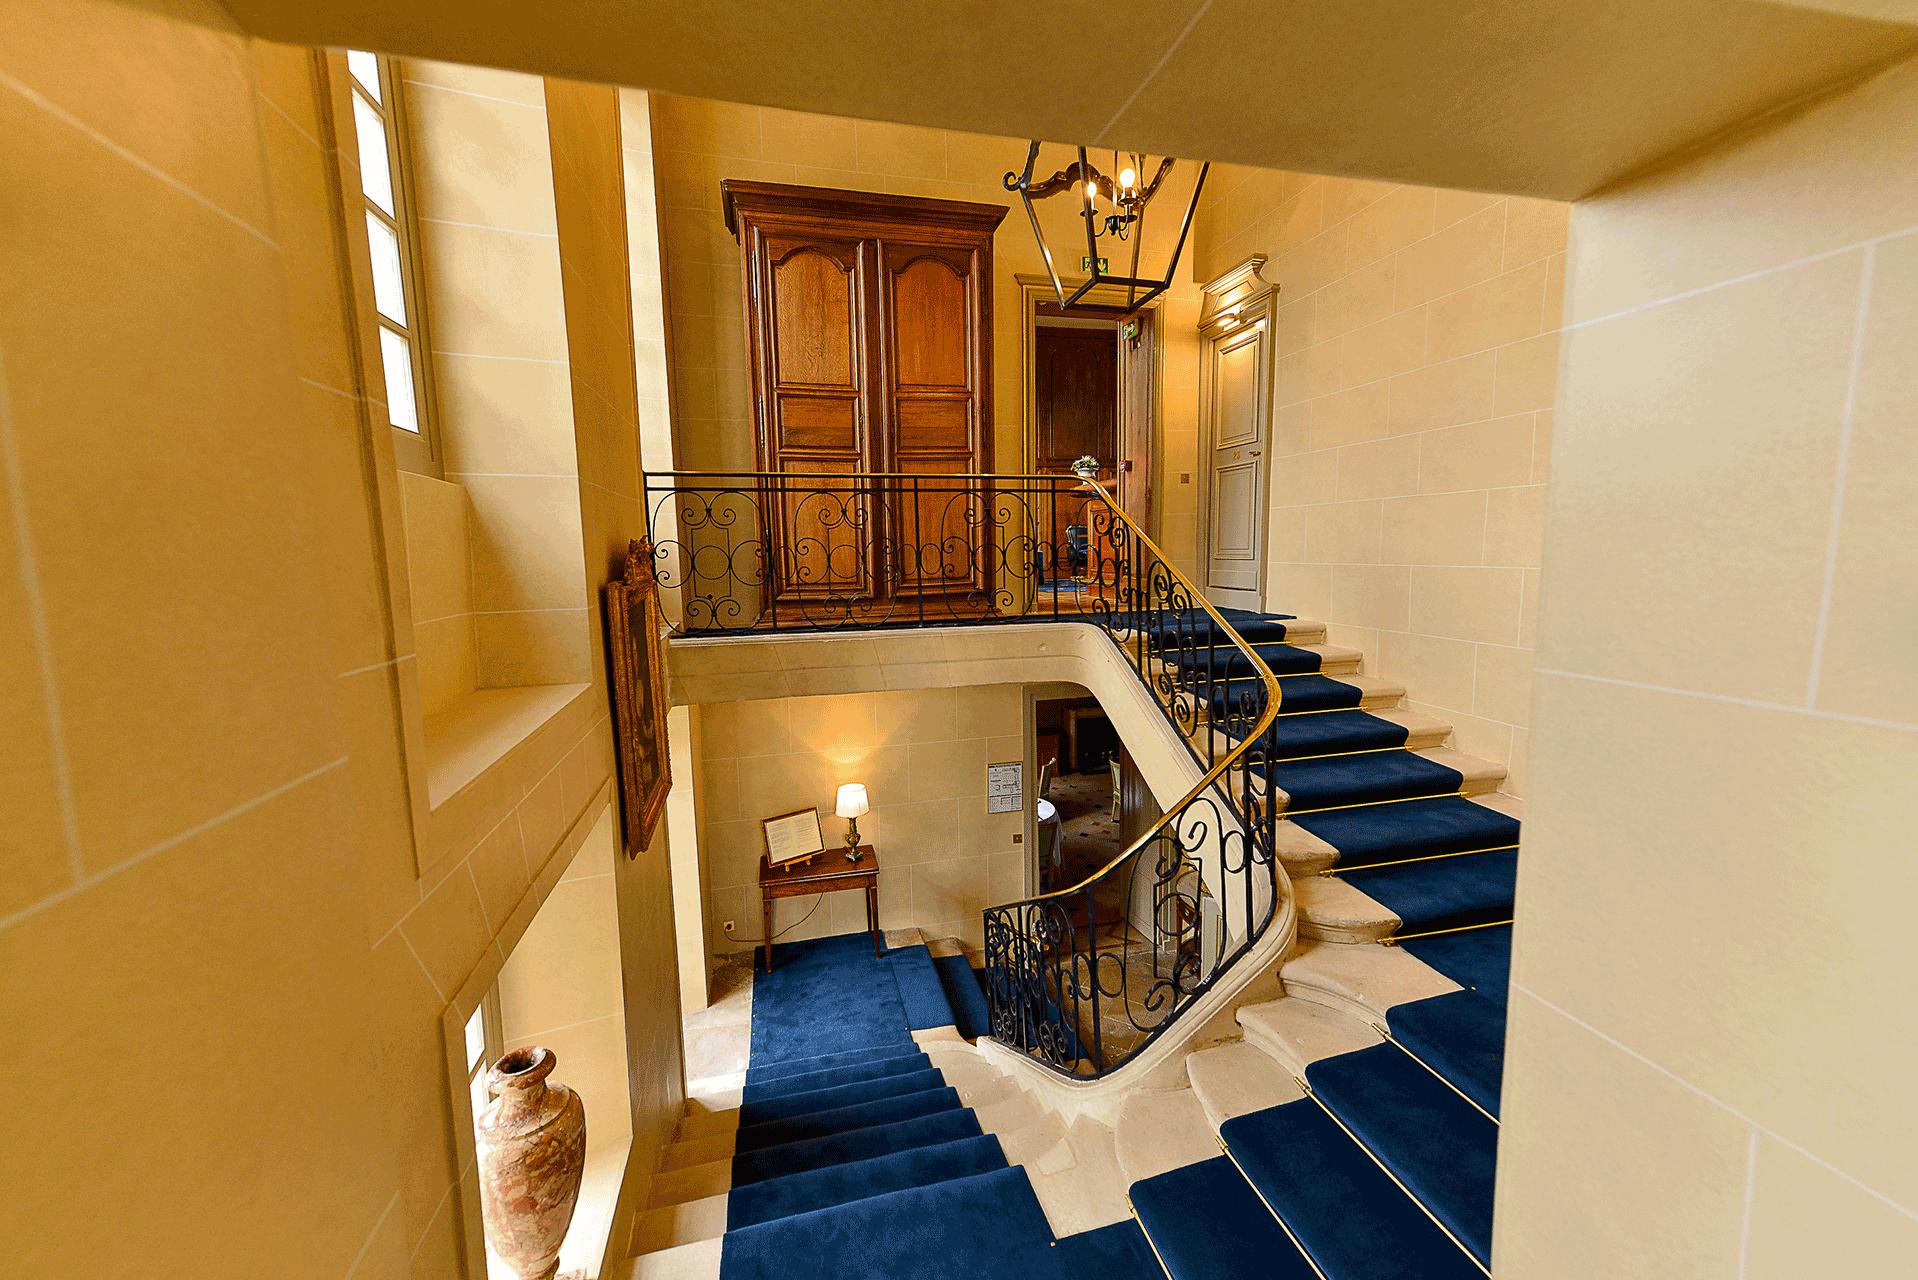 chateau-d-audrieu-photographe-resort-hauts-de-seine--maya-angelsen